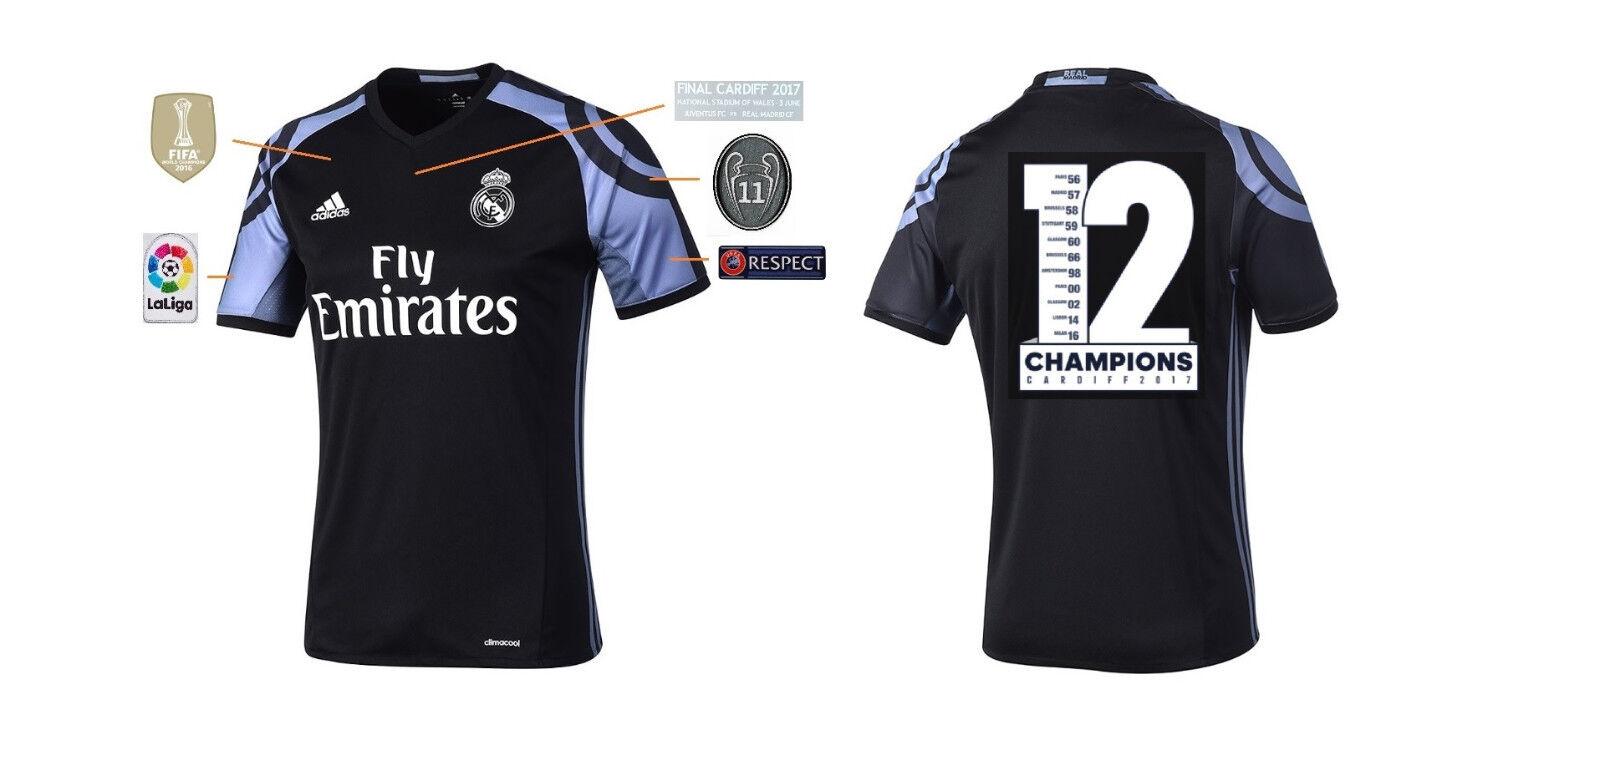 Trikot Real Madrid Third Champions League Final Cardiff 2017 - 12 Duodecima  | Haltbarer Service